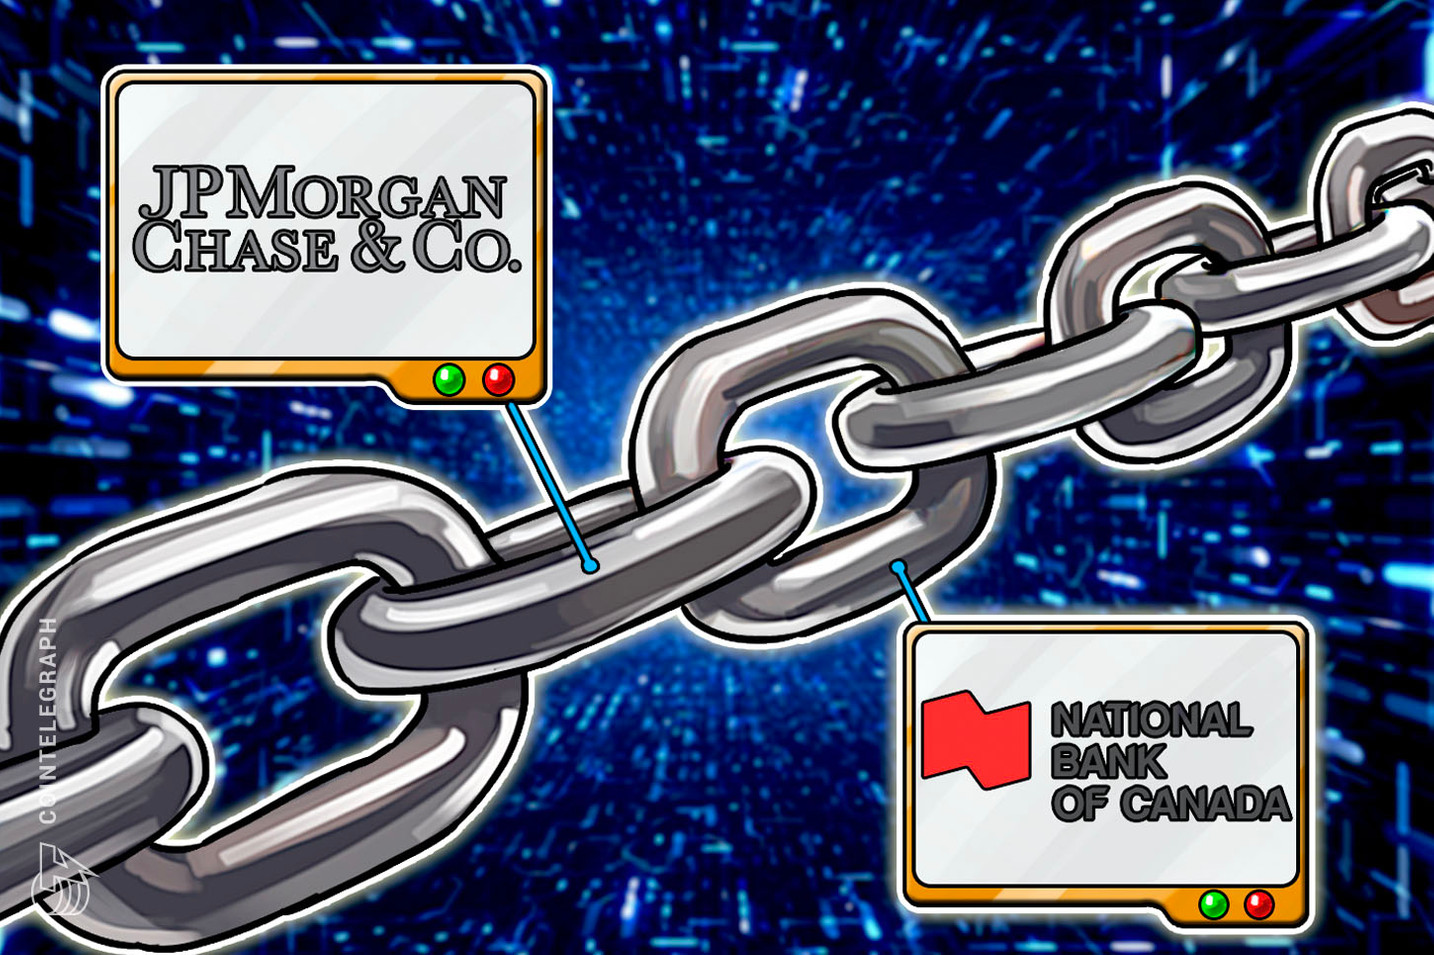 JPMorgan Tests Its Quorum Blockchain Platform After Year Of Development